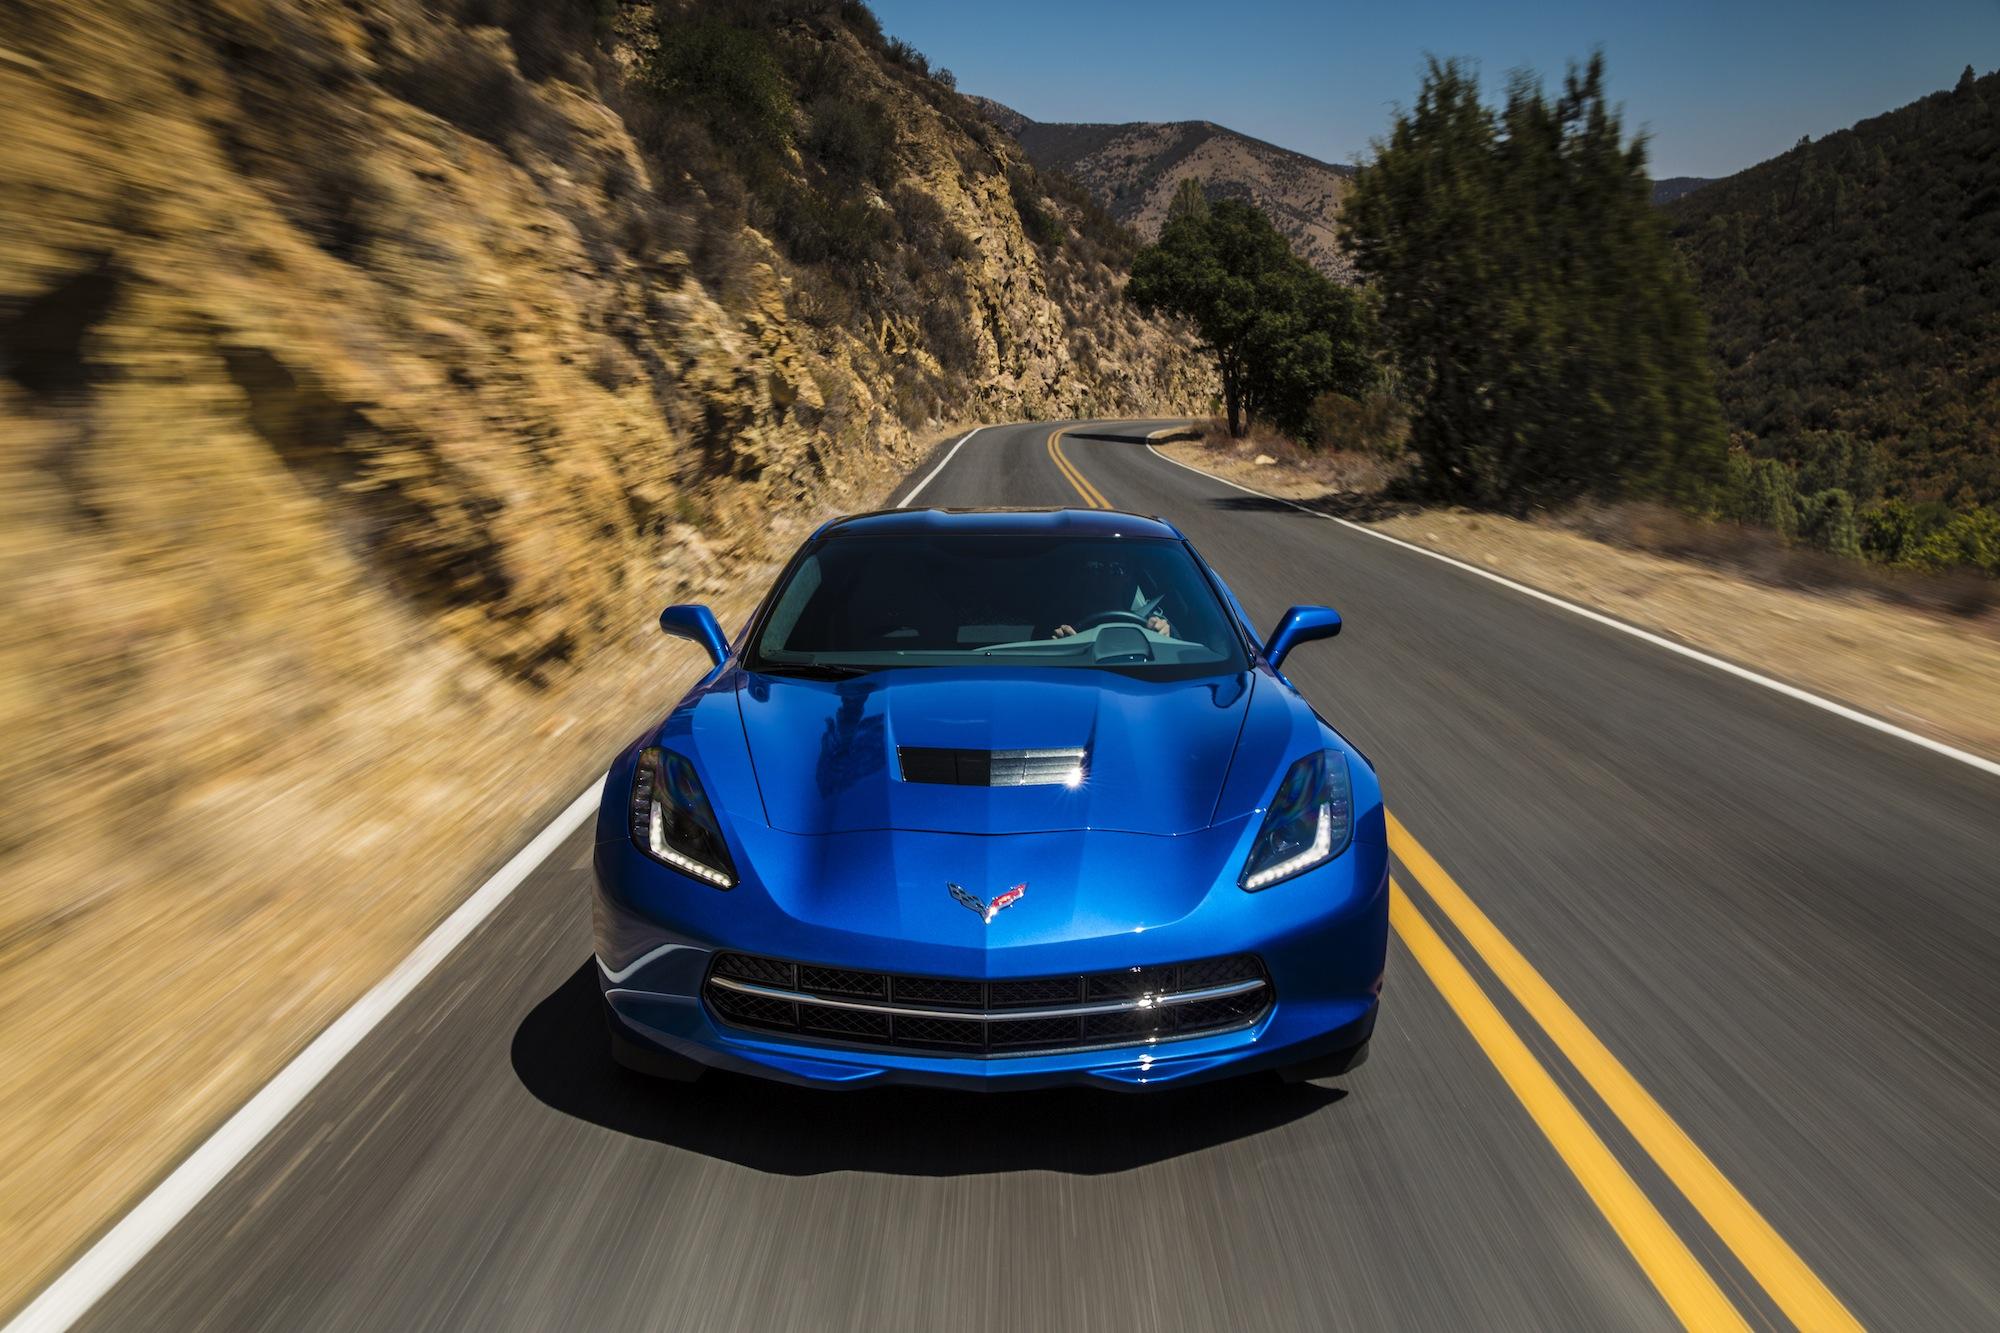 2014 Chevrolet Corvette Stingray First Drive Review